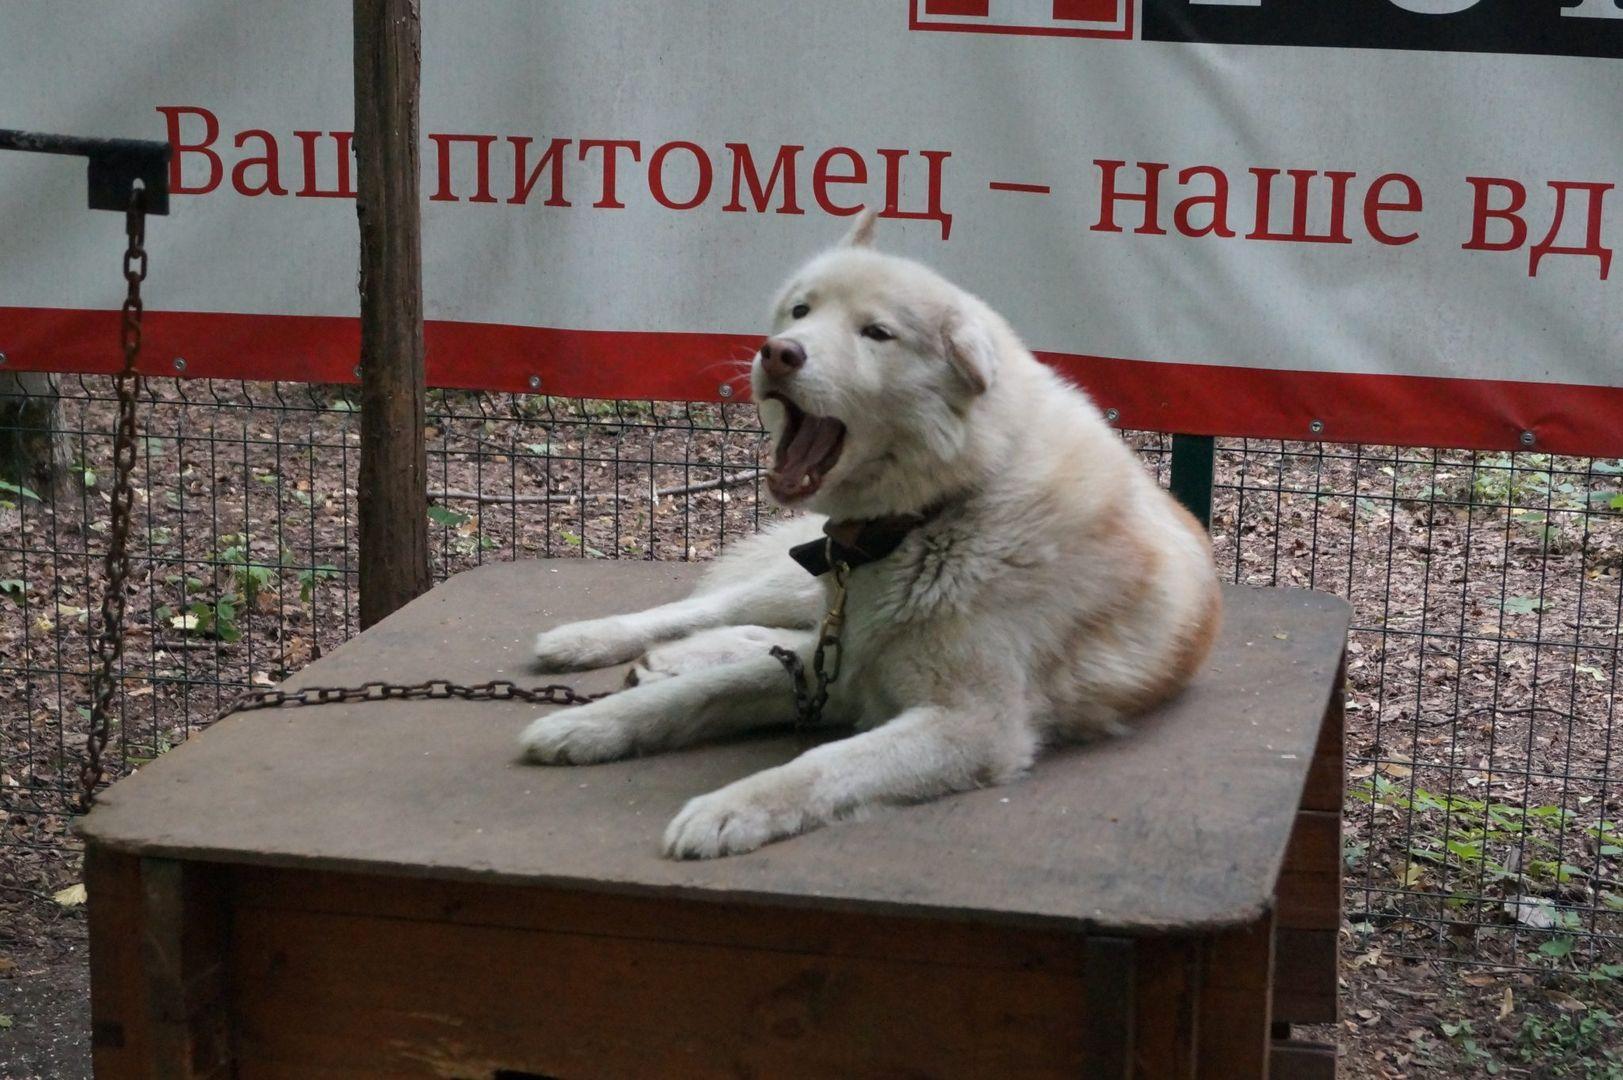 Хаски-парк, Сокольники